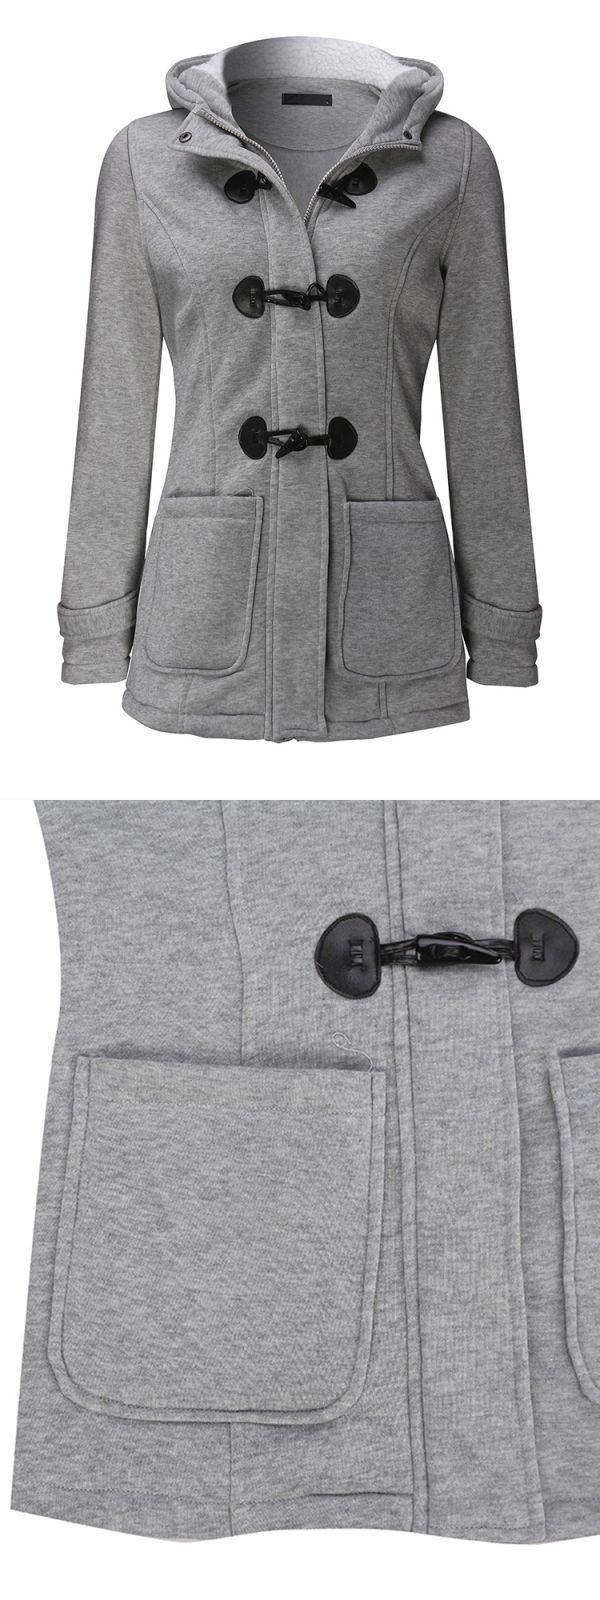 V christina jackets casual women long sleeve solid color hooded horn buttons coat #jackets #debenhams #jackie #o #jackets #jules #b #jackets #logo #7 #jackets